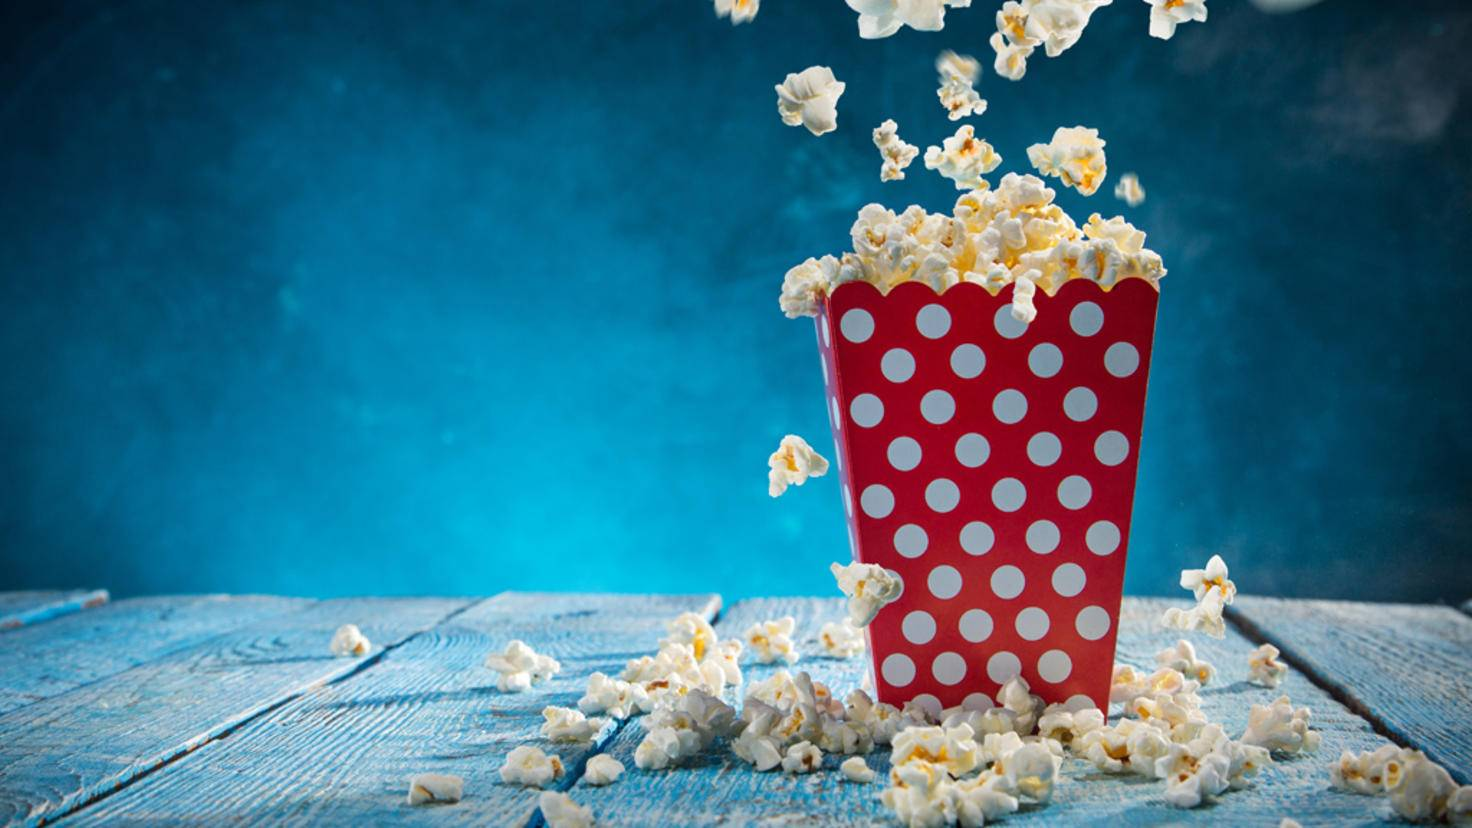 Popcorn Film gucken